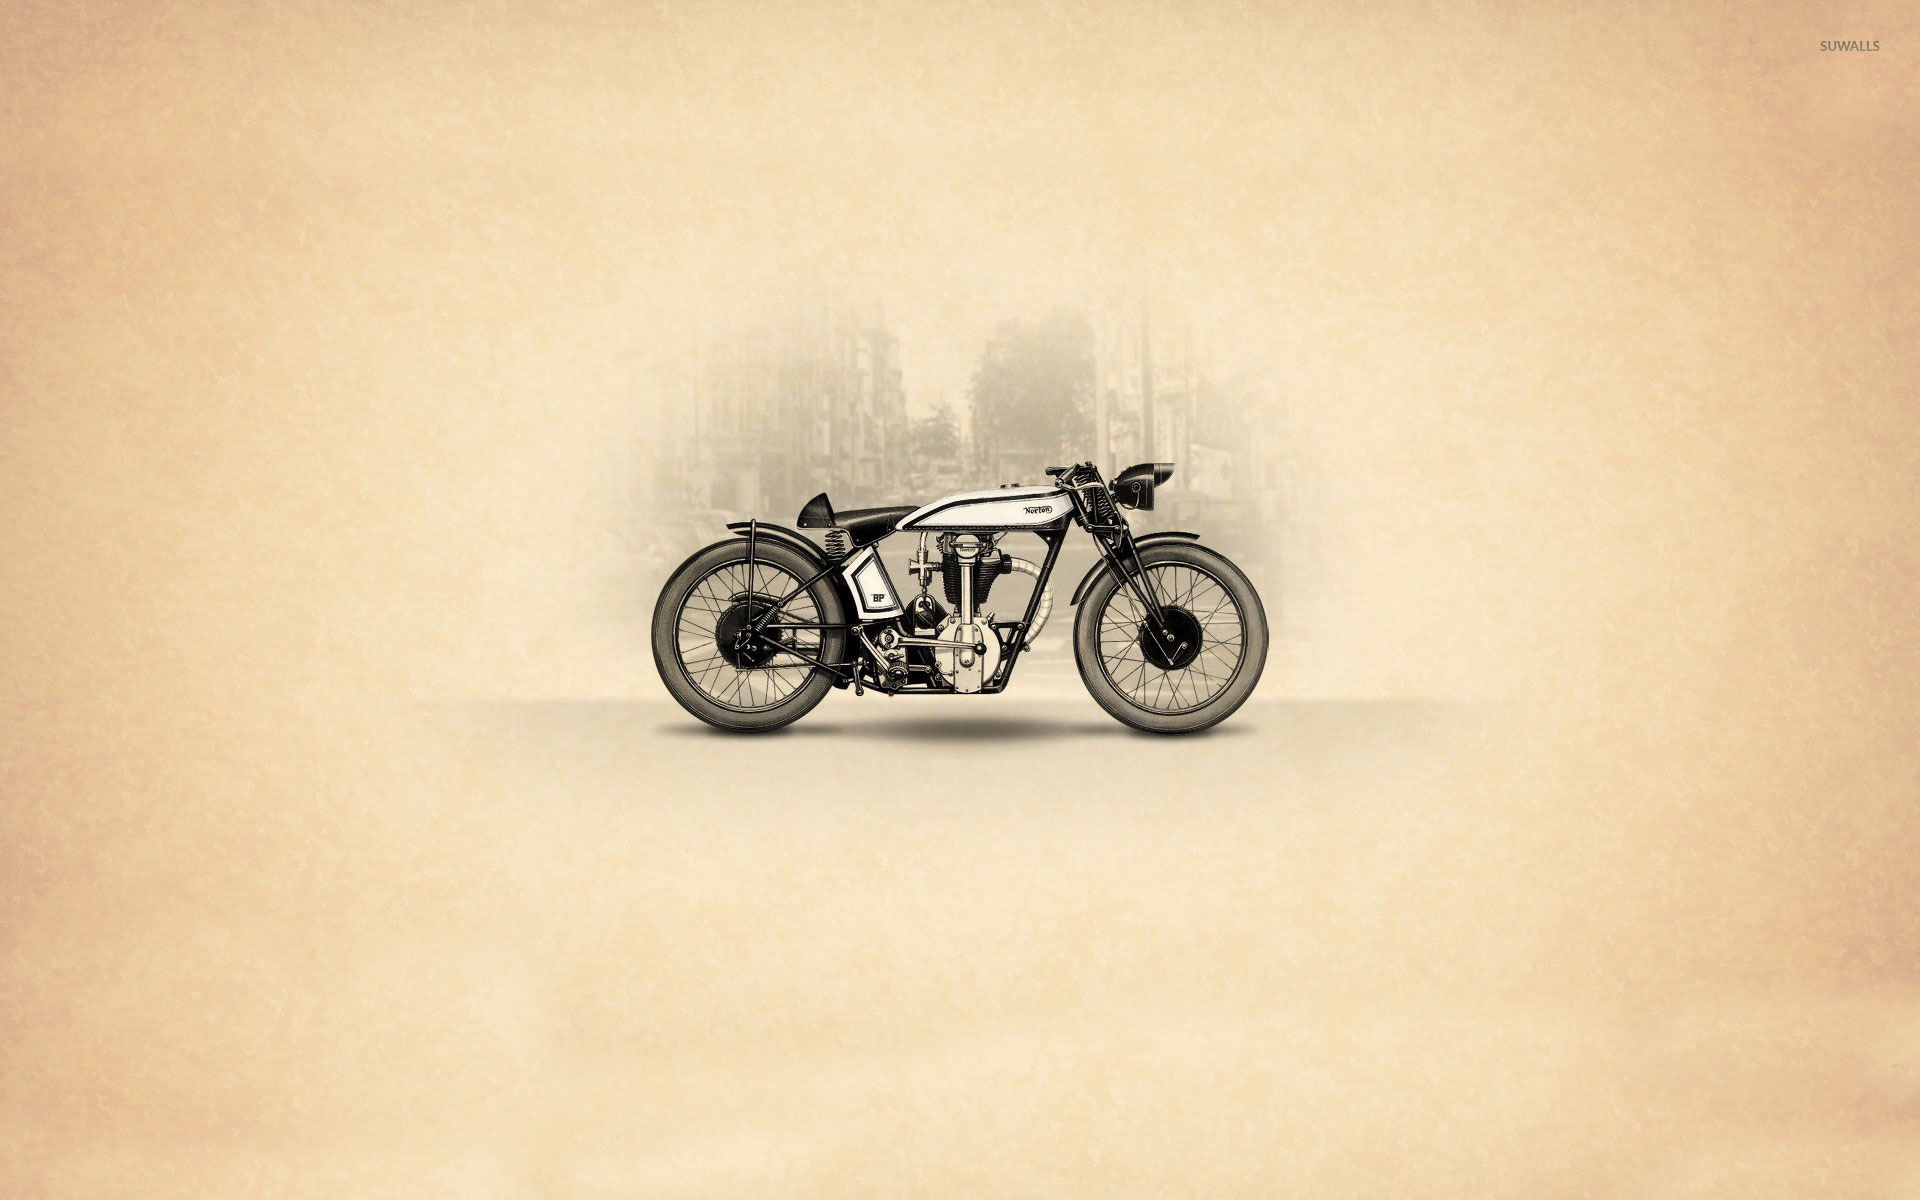 1929 Norton Cafe Racer Wallpaper Motorcycle 261806 Hd